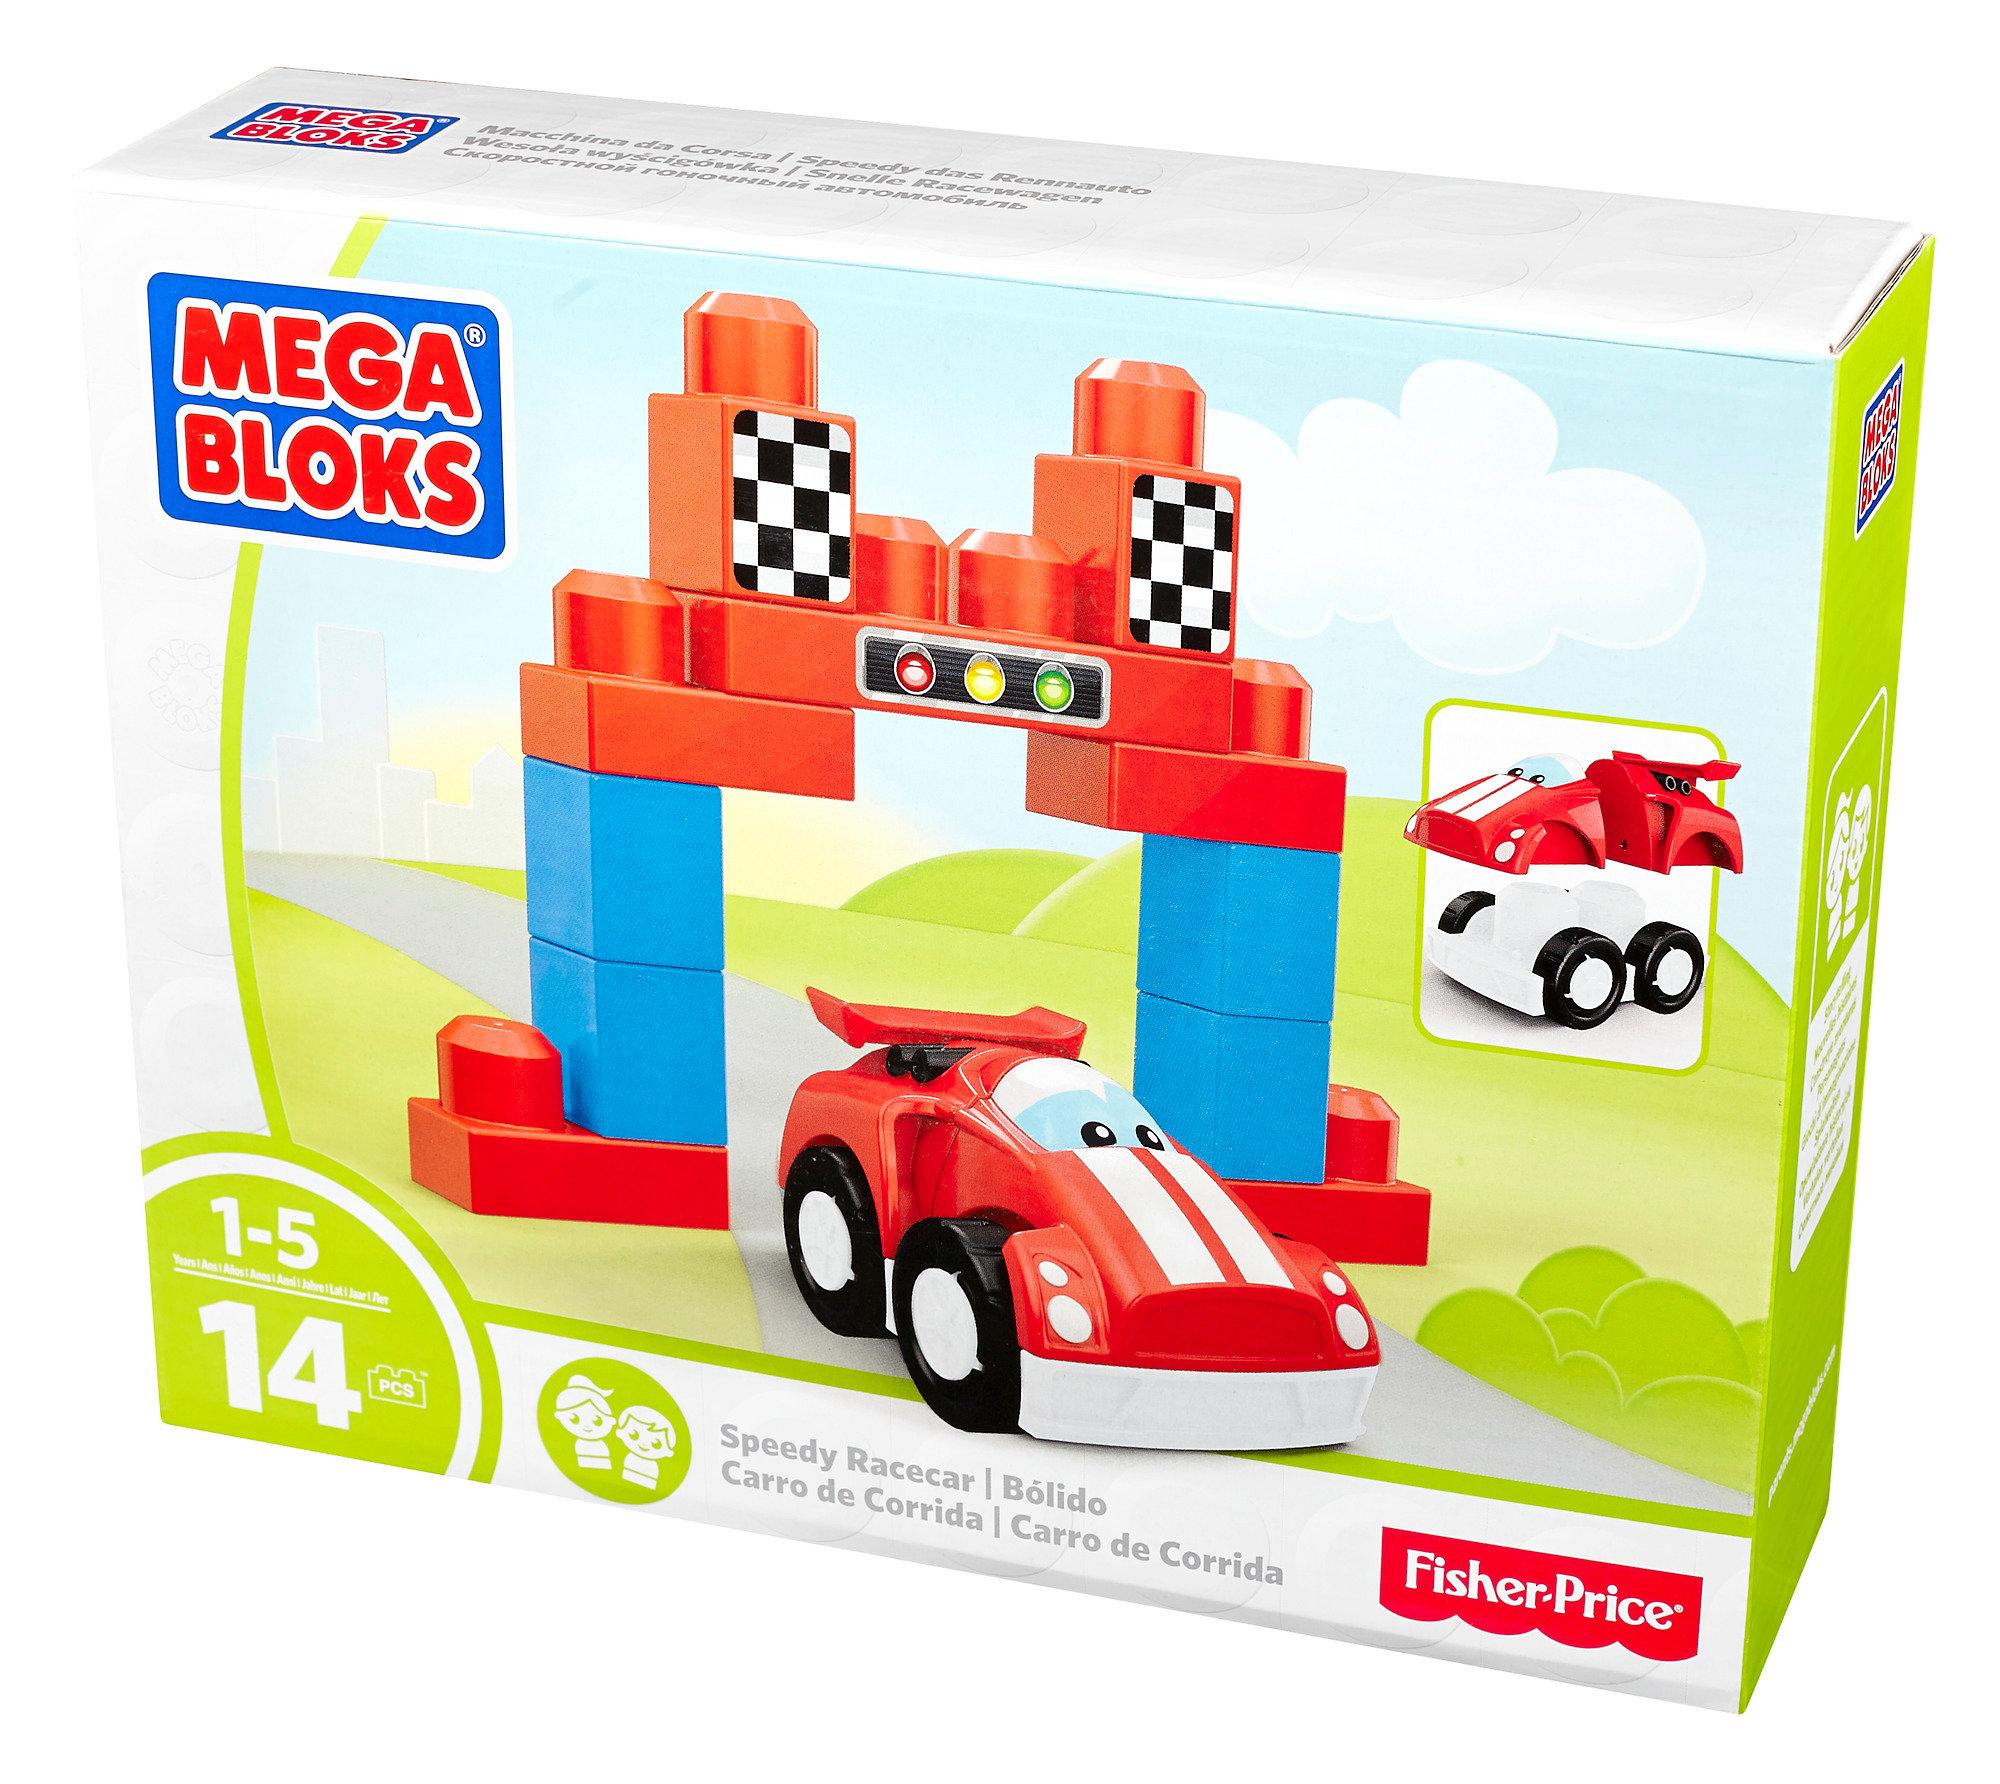 Mega Bloks First Builders Speedy Racecar Building Set Mega Bloks First Builders Speedy... by Mattel